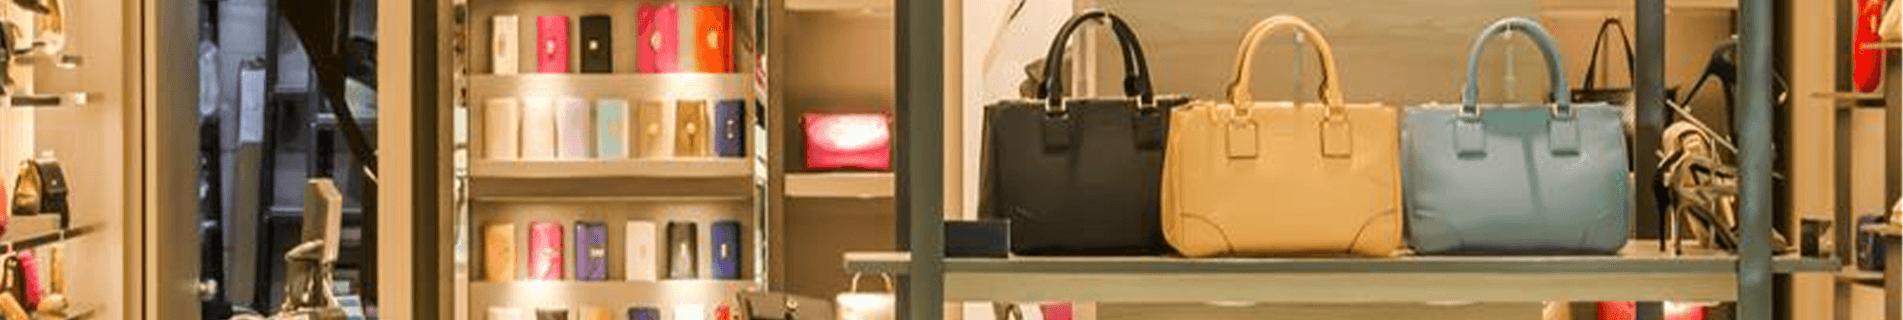 Trend retail 2021